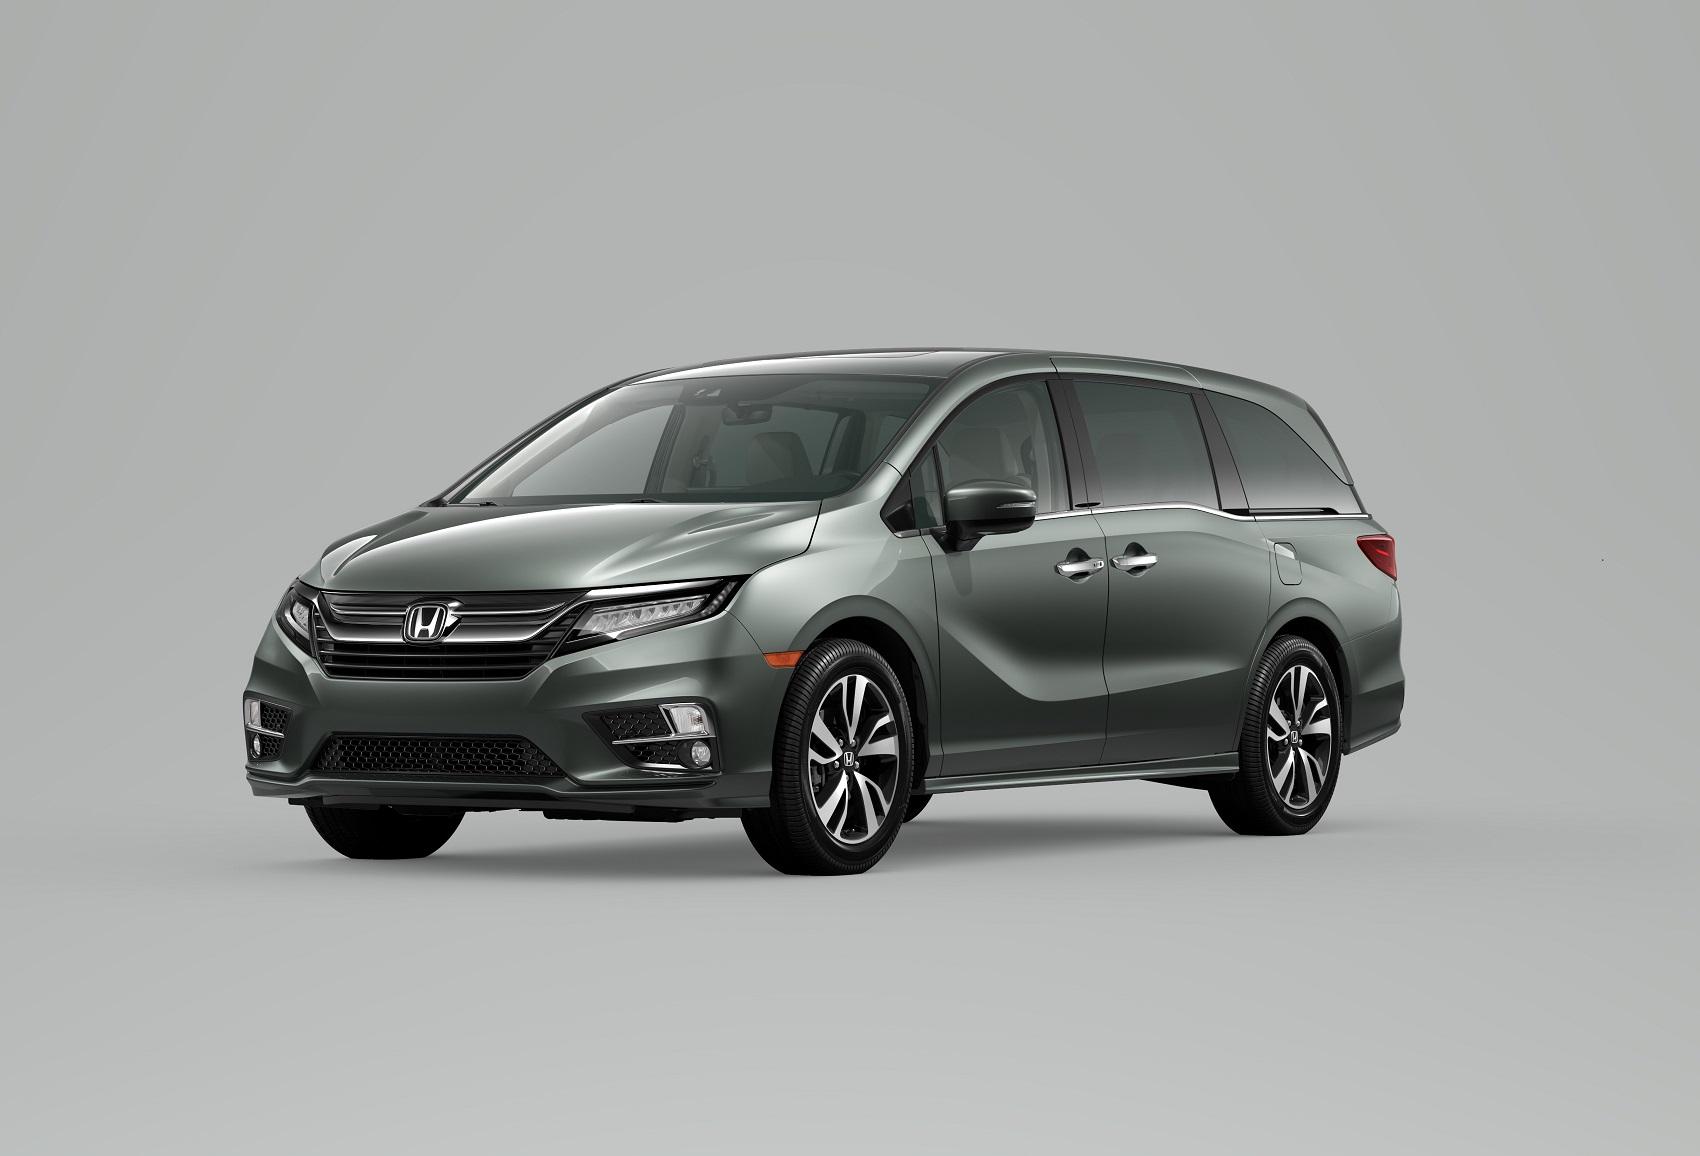 2020 Honda Odyssey Features